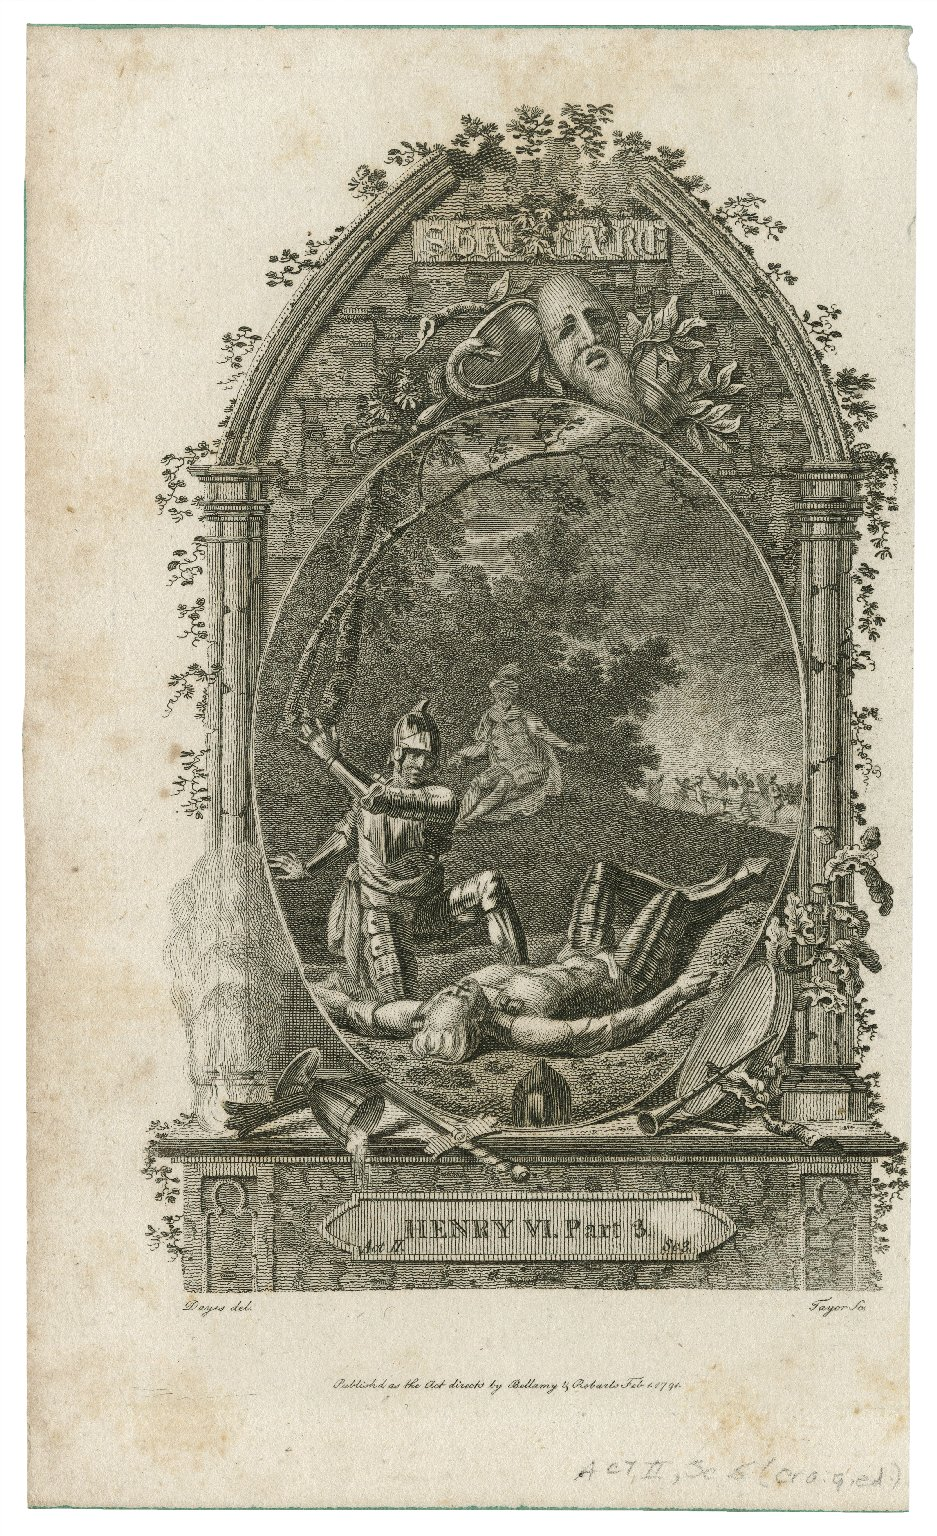 Henry VI, part 3, act II, sc. 3 [i.e. sc. 5] [graphic] / Dayes, del. ; Tayor [i.e. Taylor] sc.